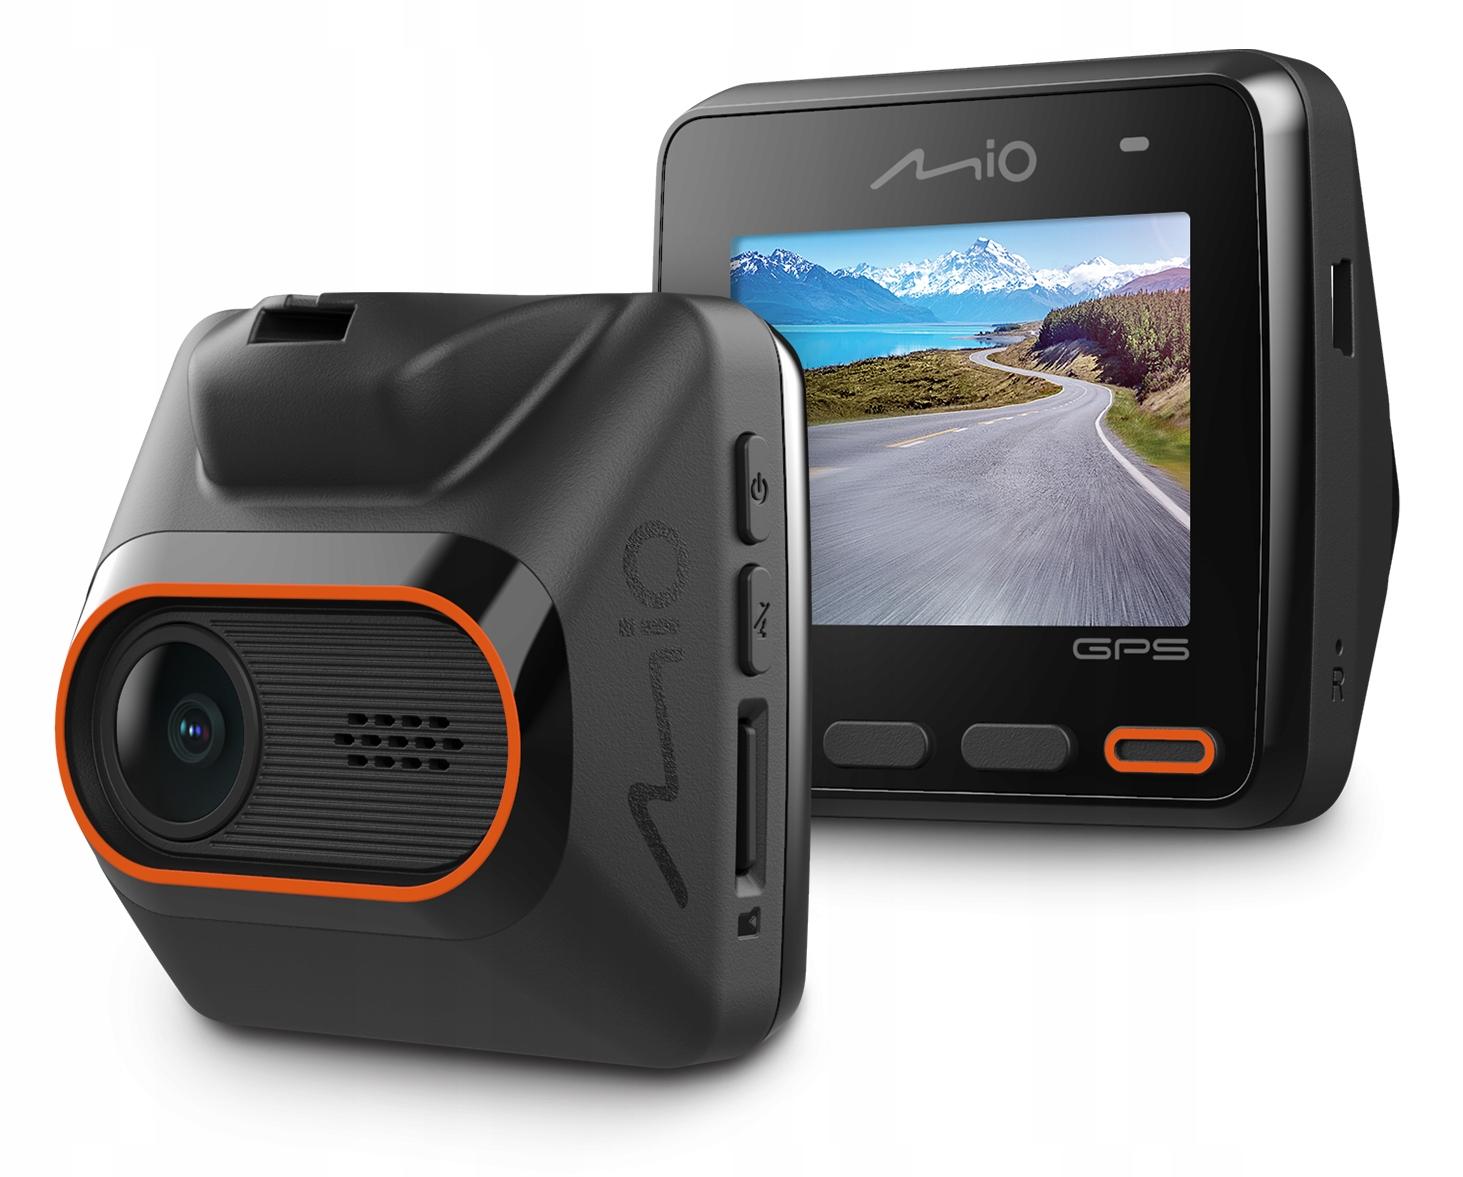 MIO MIVUE C430 REJESTRATOR GPS BAZA FOTORADARÓW EAN 4713264285071